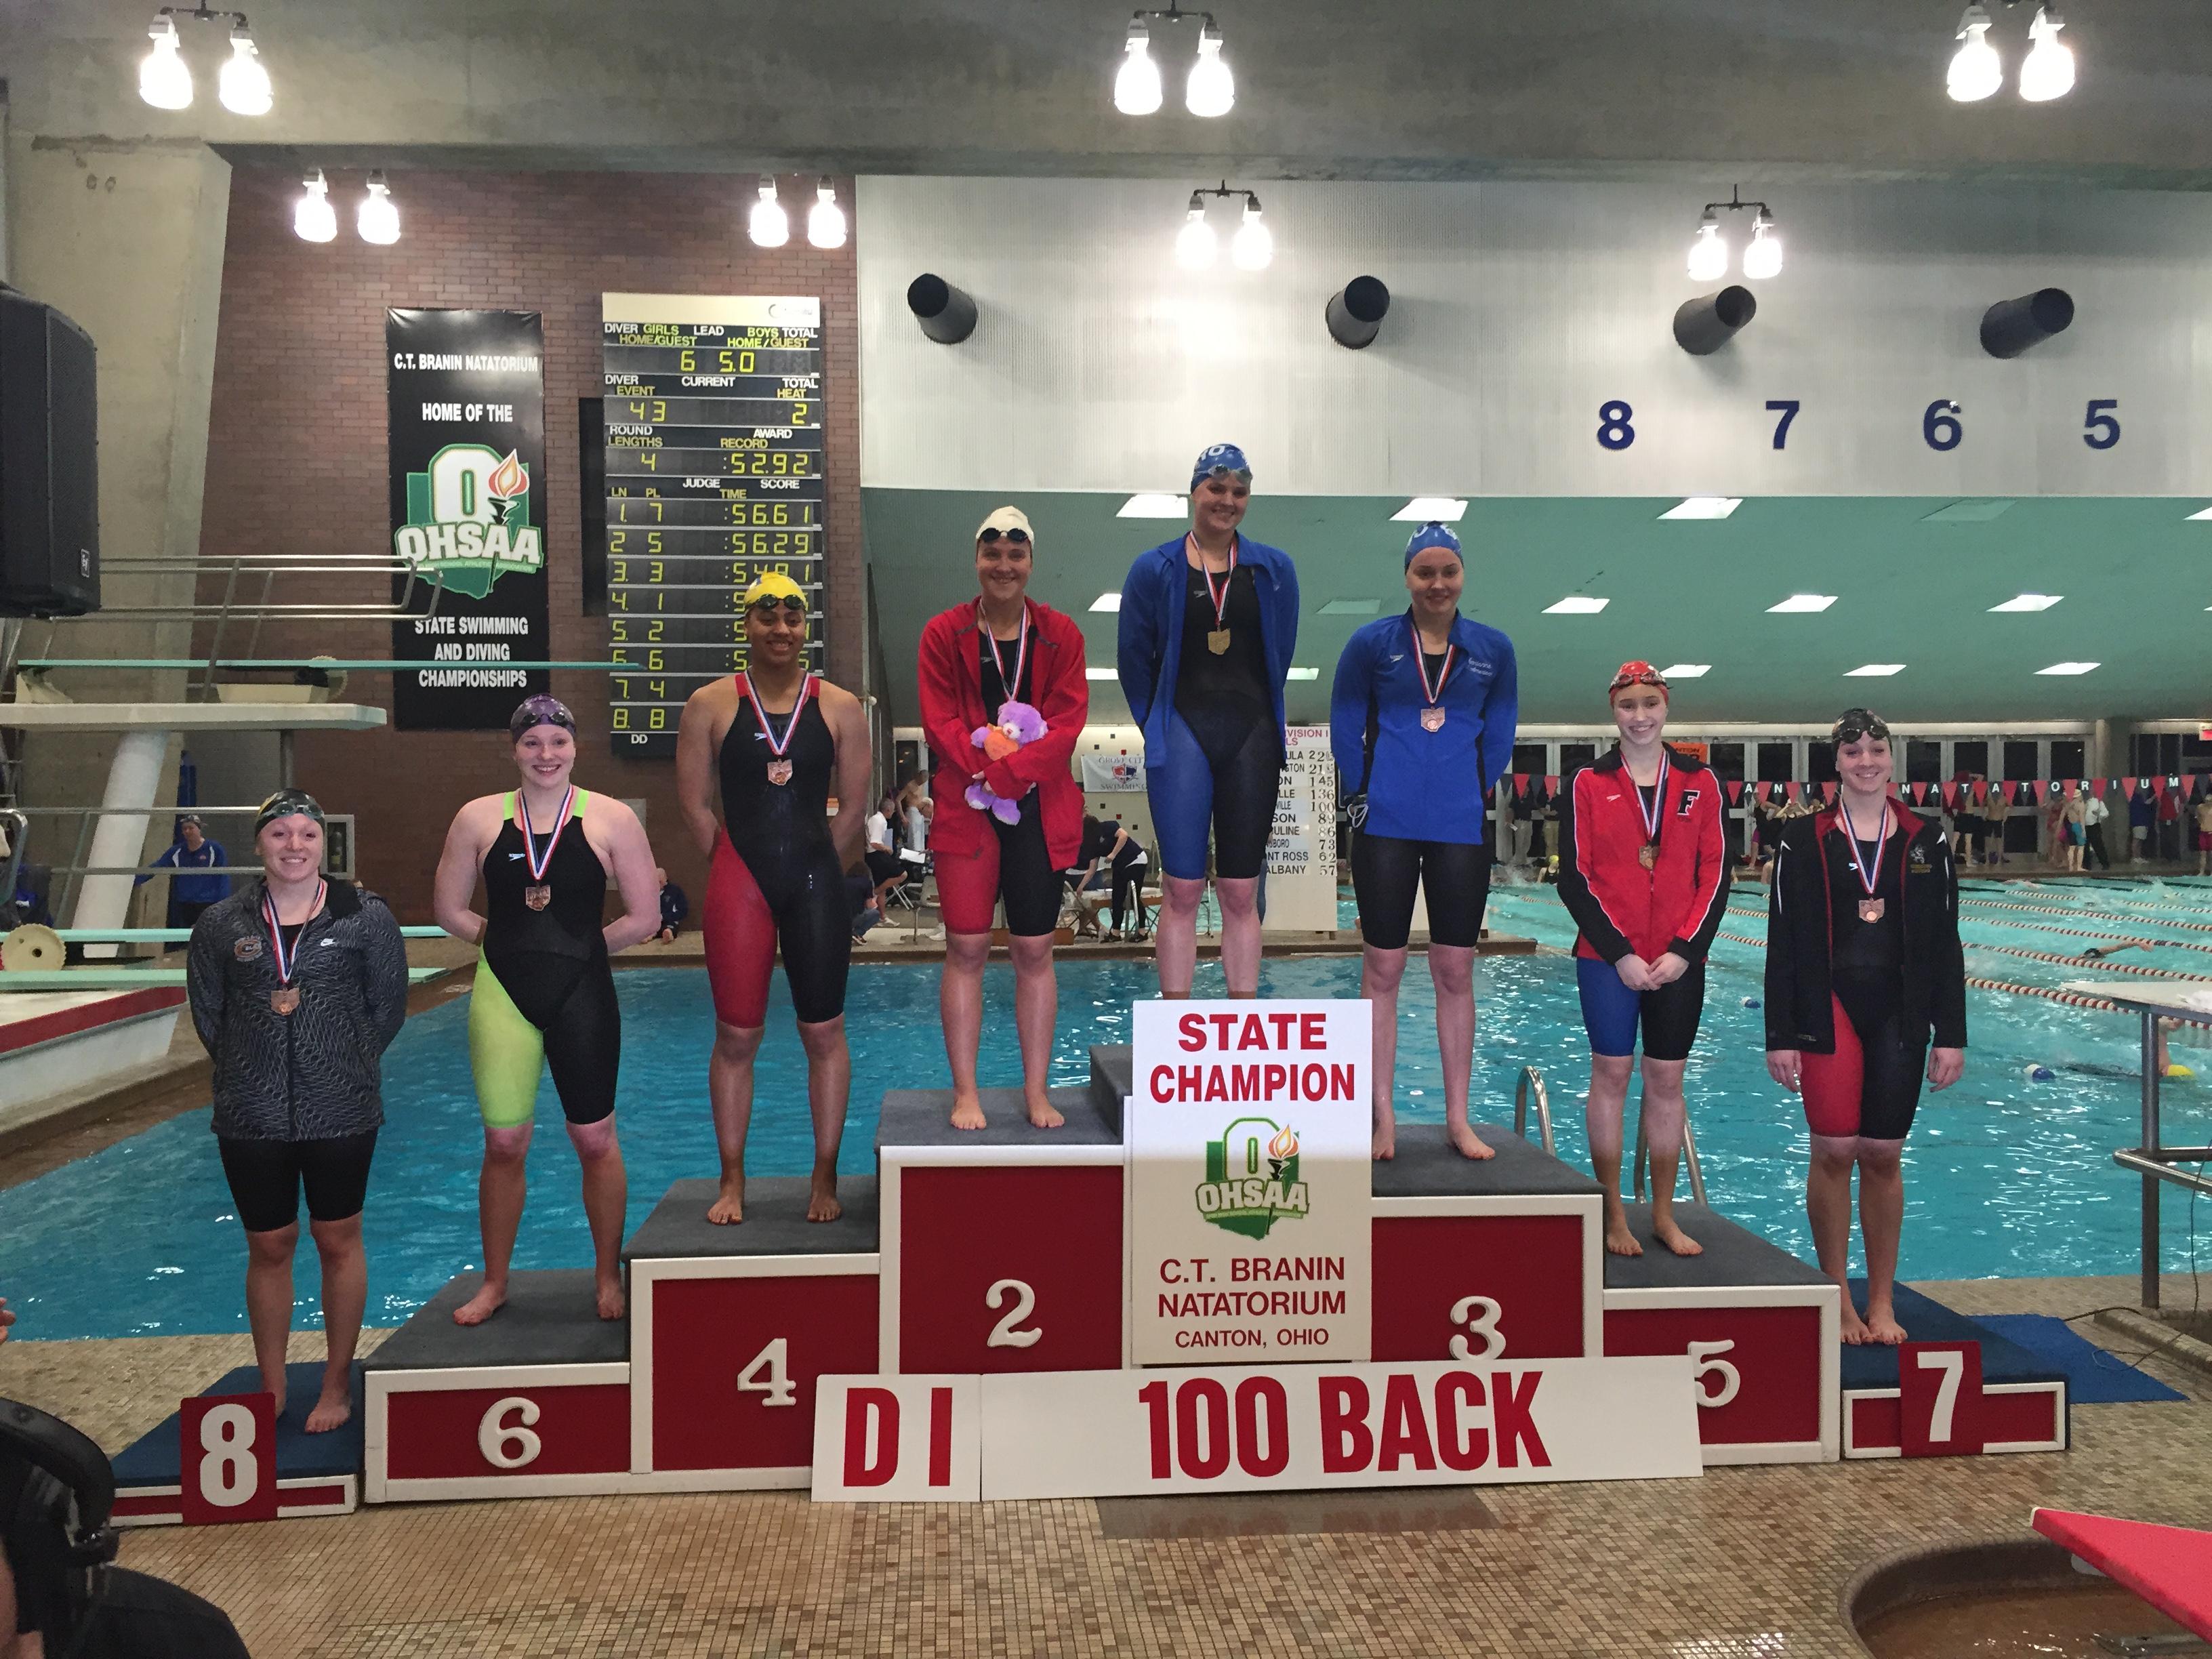 Ohsaa D1 Women 100 Back 2015 Swimming World News